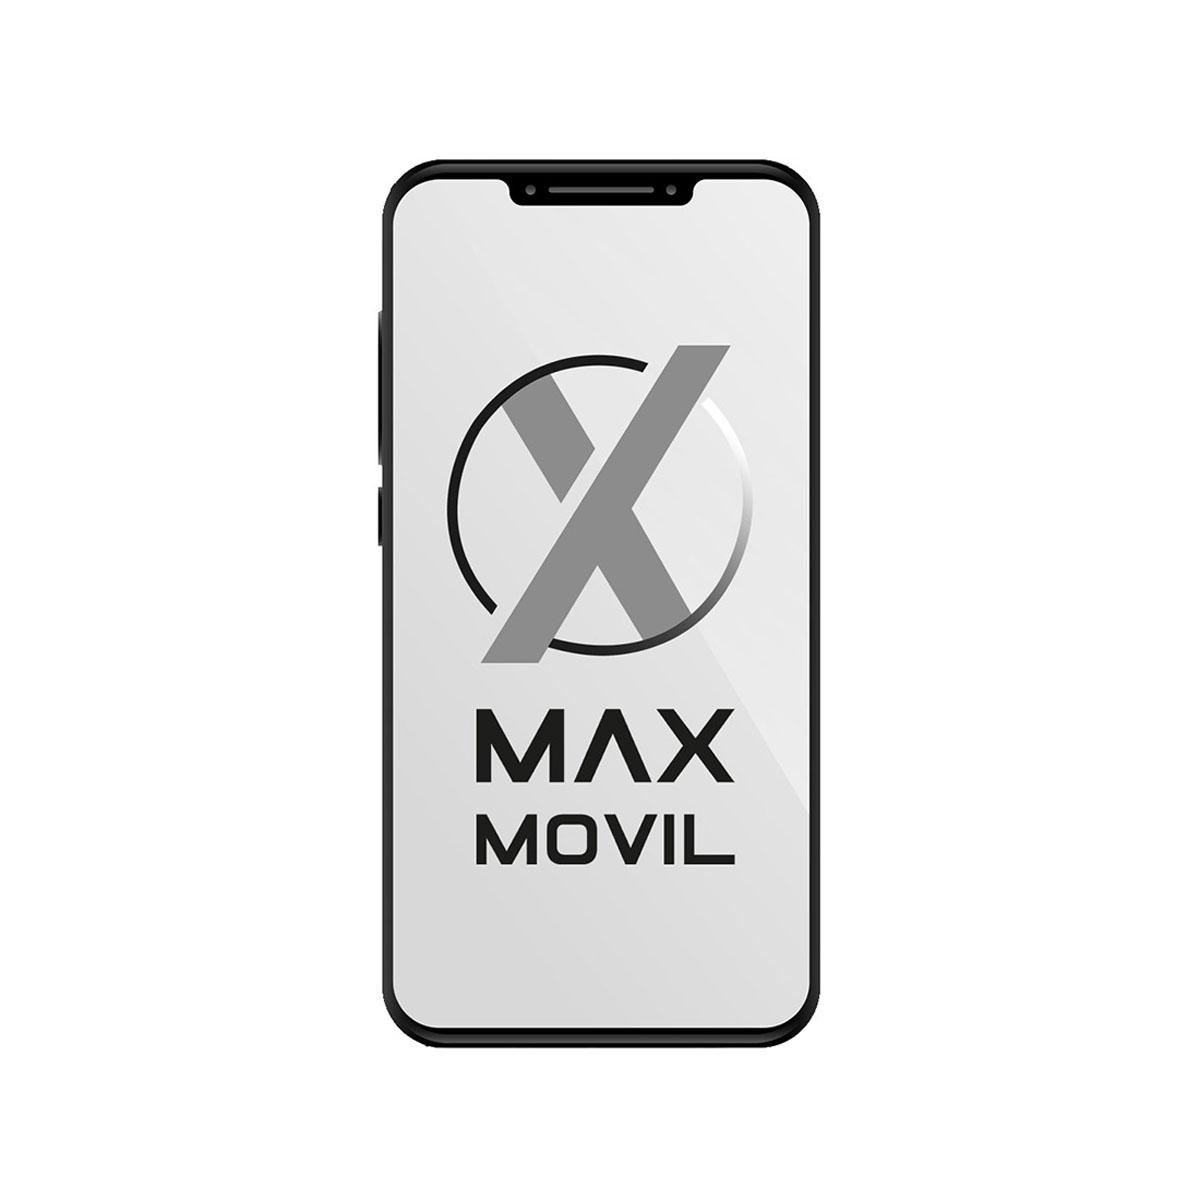 Telefono movil Iphone 4S 16 GB Libre Negro ECO- RECICLADO GRADO A